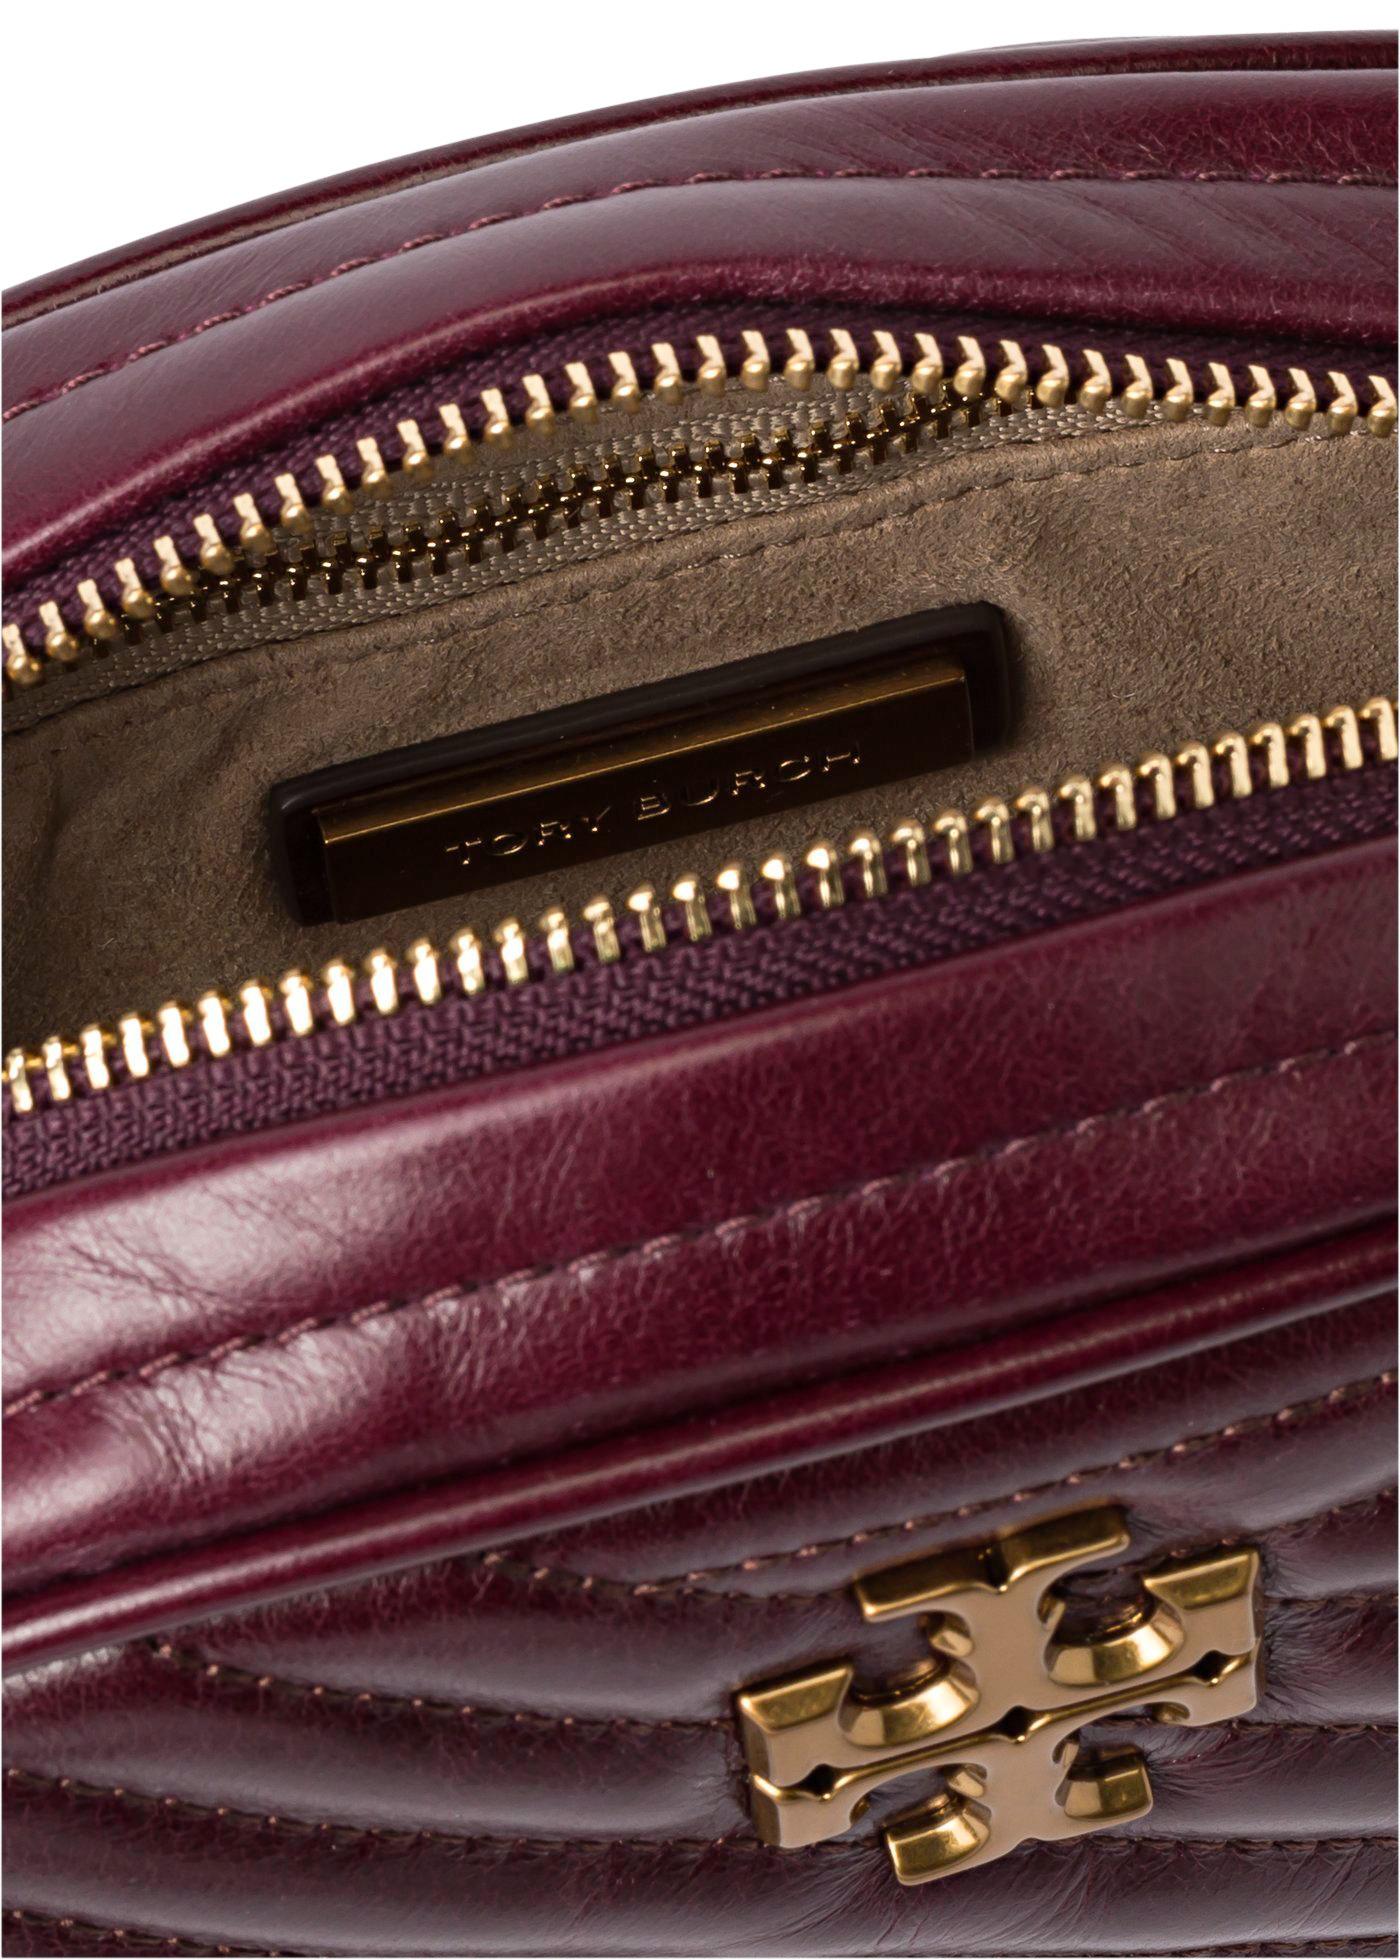 KIRA CHEVRON GLAZED SMALL CAMERA BAG image number 3